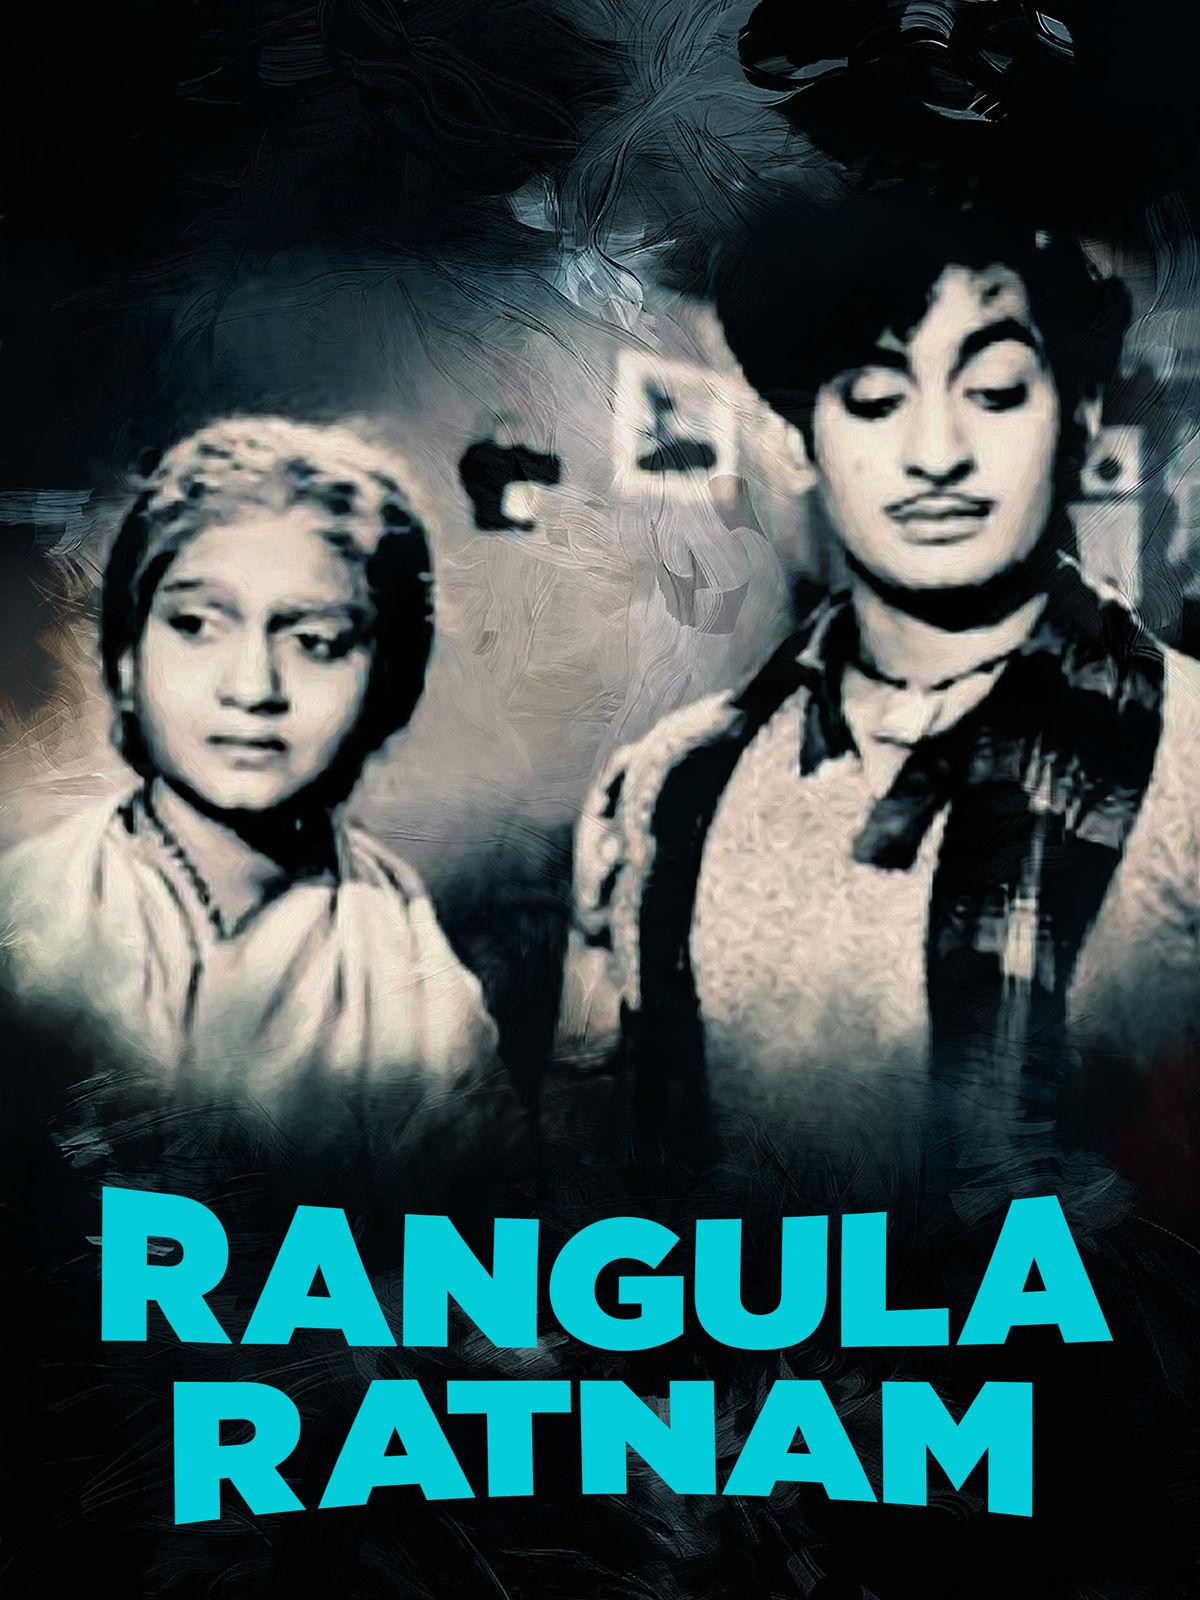 Rangula Ratnam